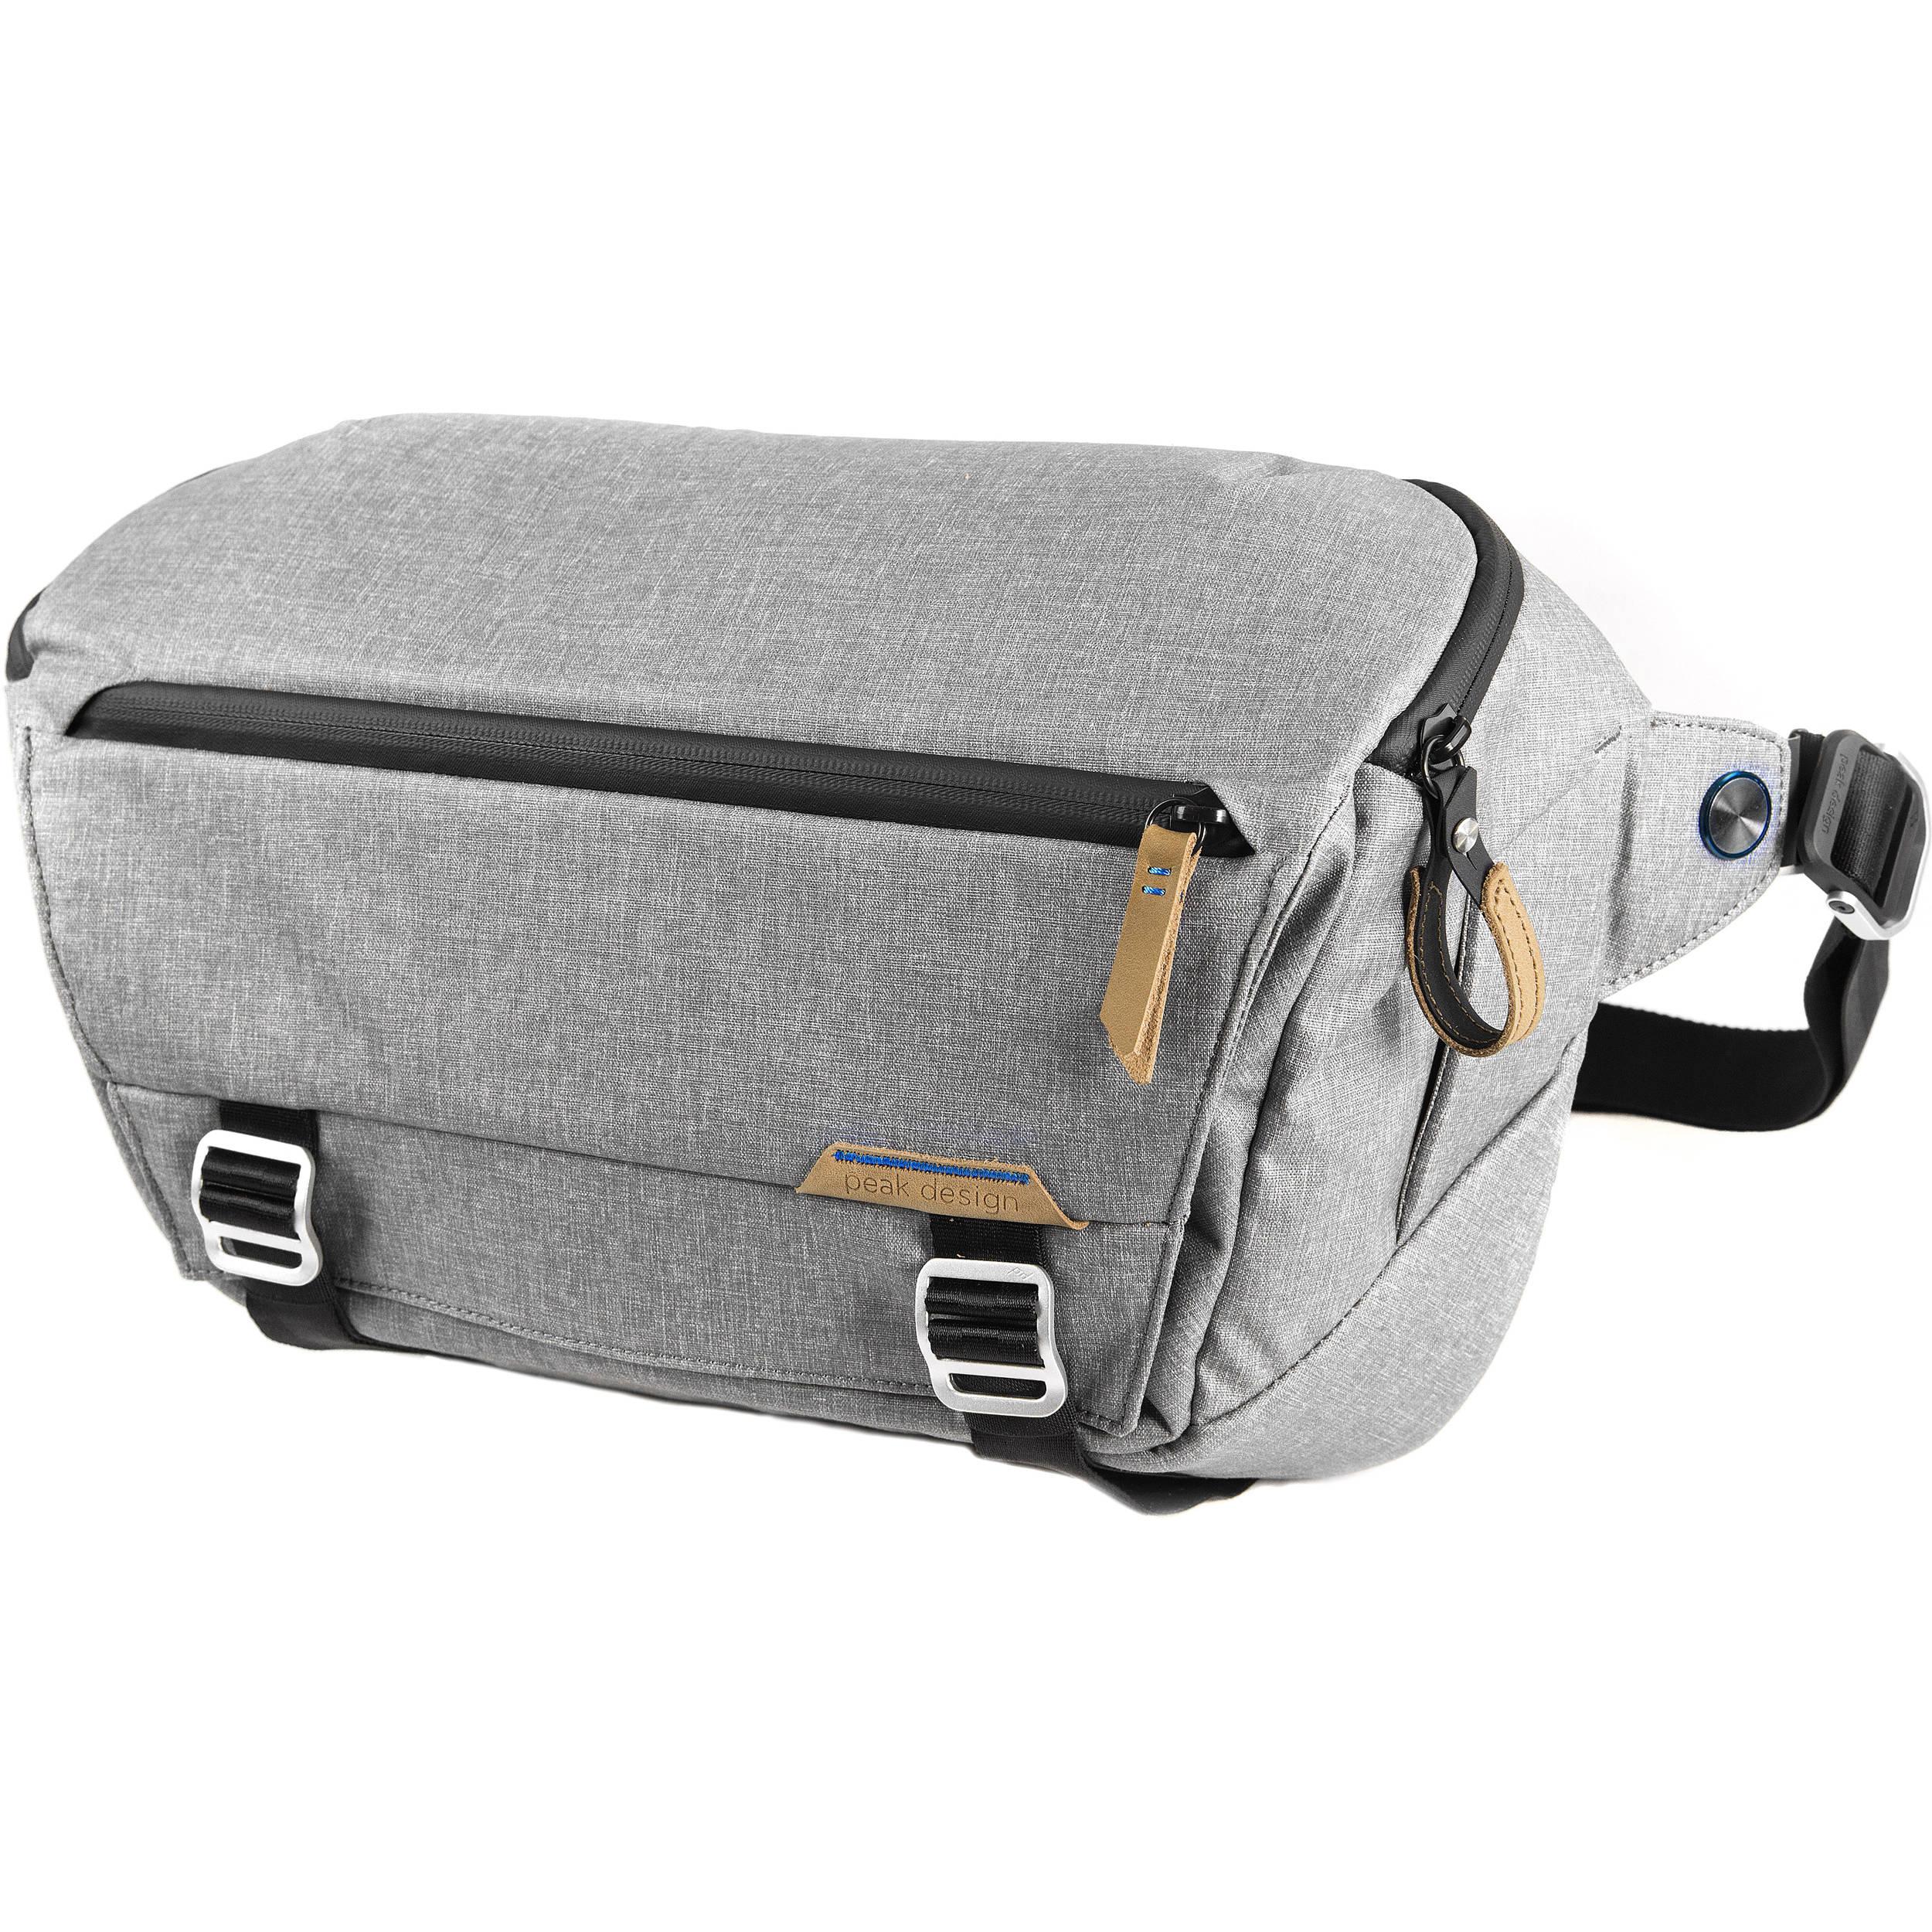 Peak Design Everyday Sling Case Grey